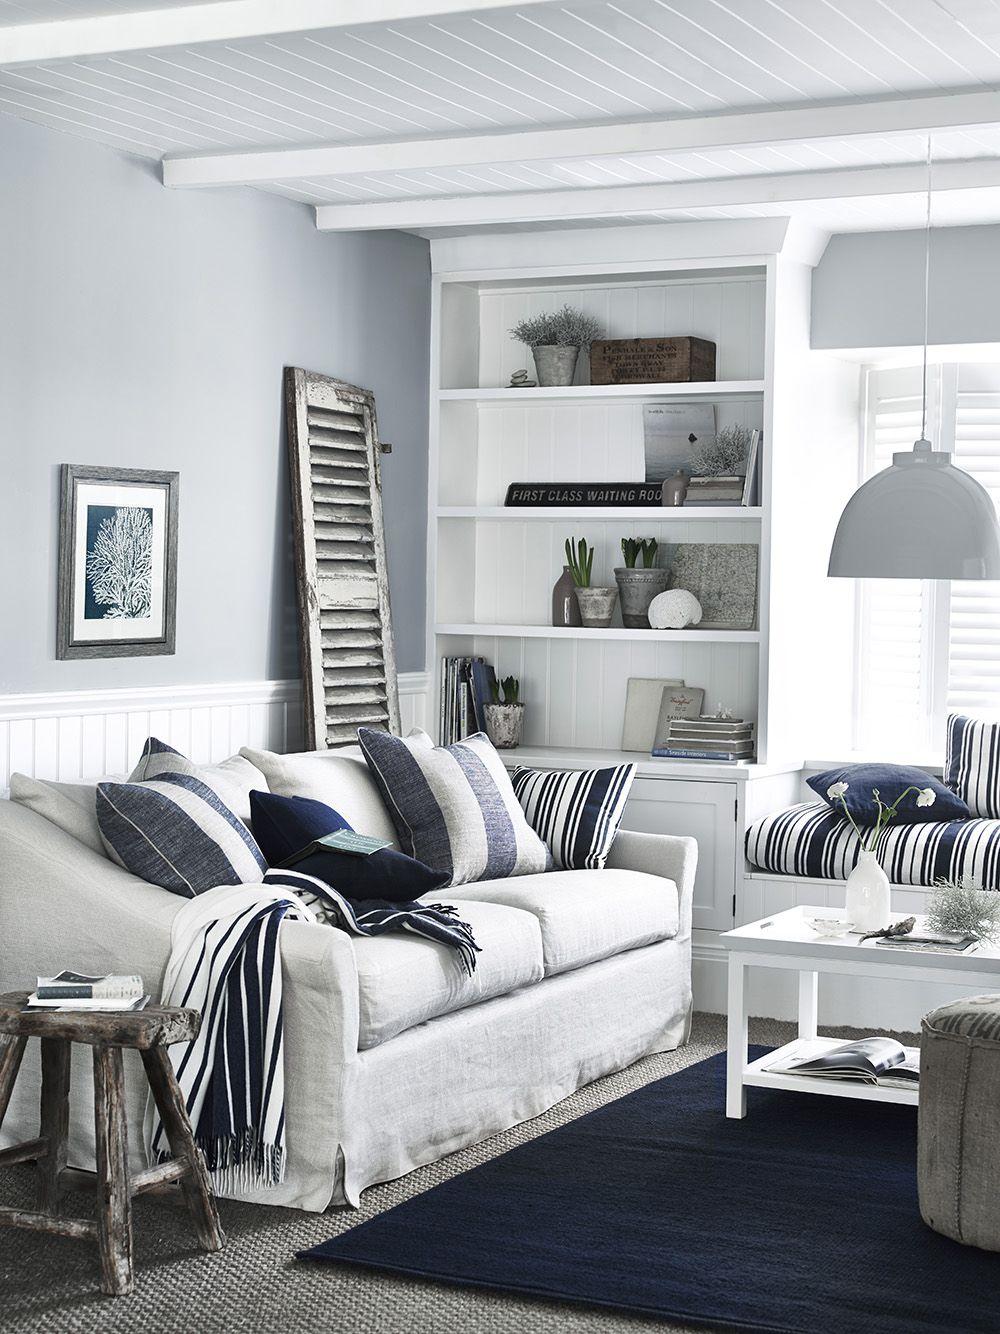 living room furniture long island cool gadgets sofa in pale oat www neptune com home decor